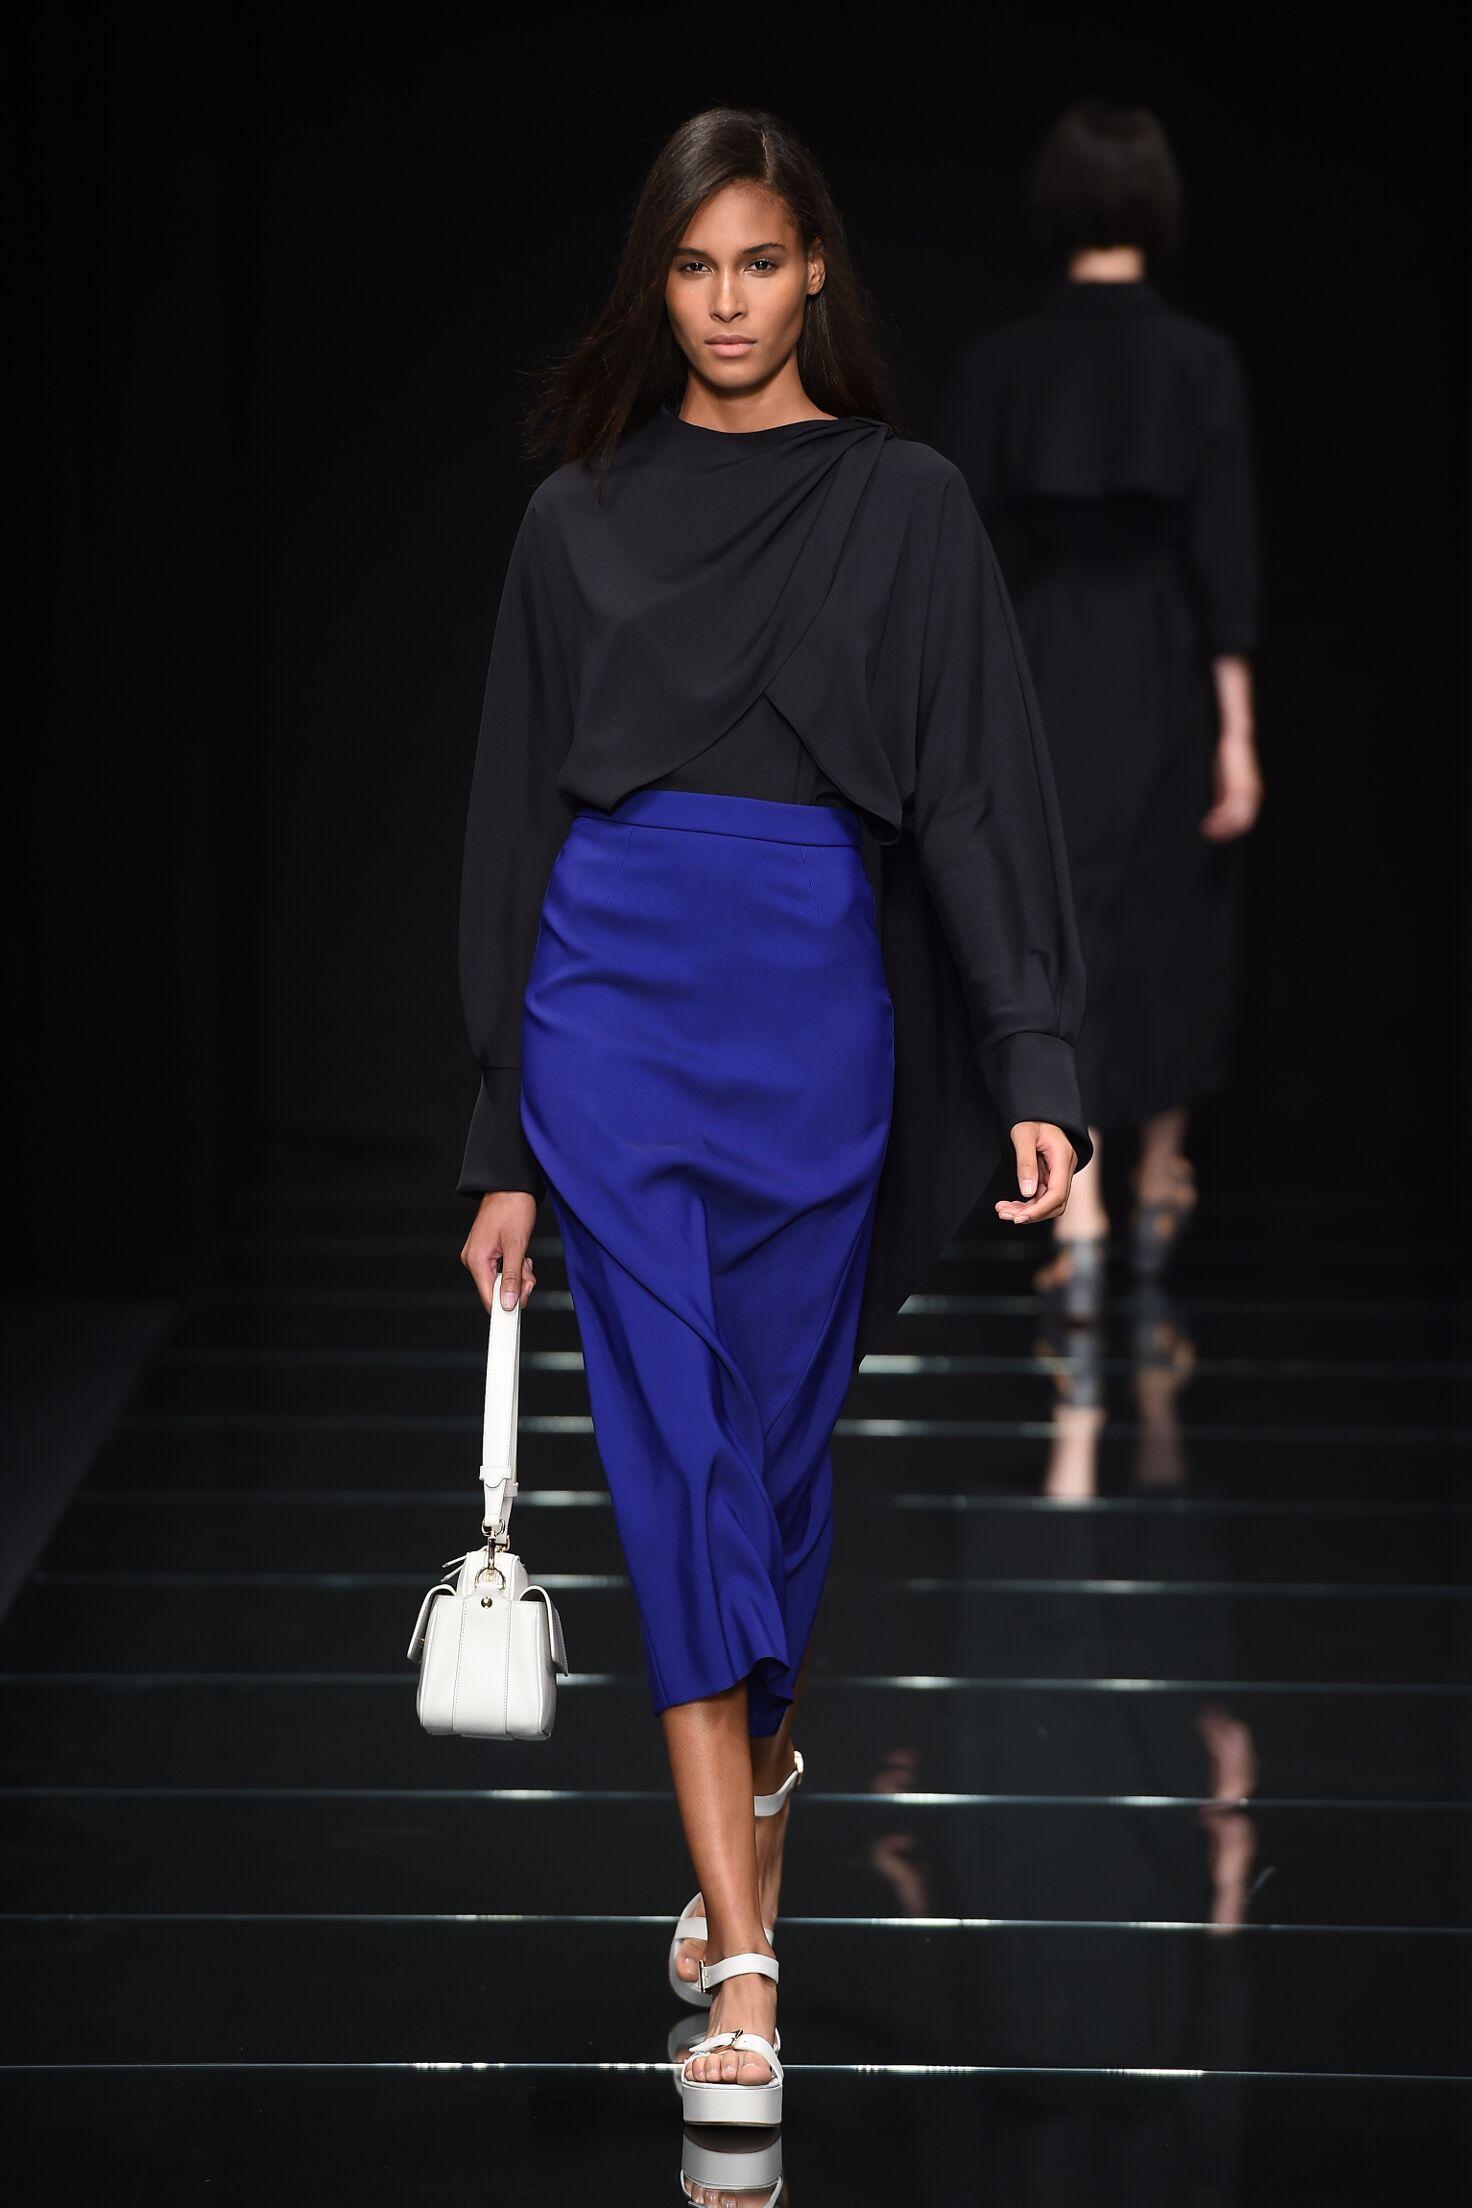 Catwalk Anteprima Woman Fashion Show Summer 2015